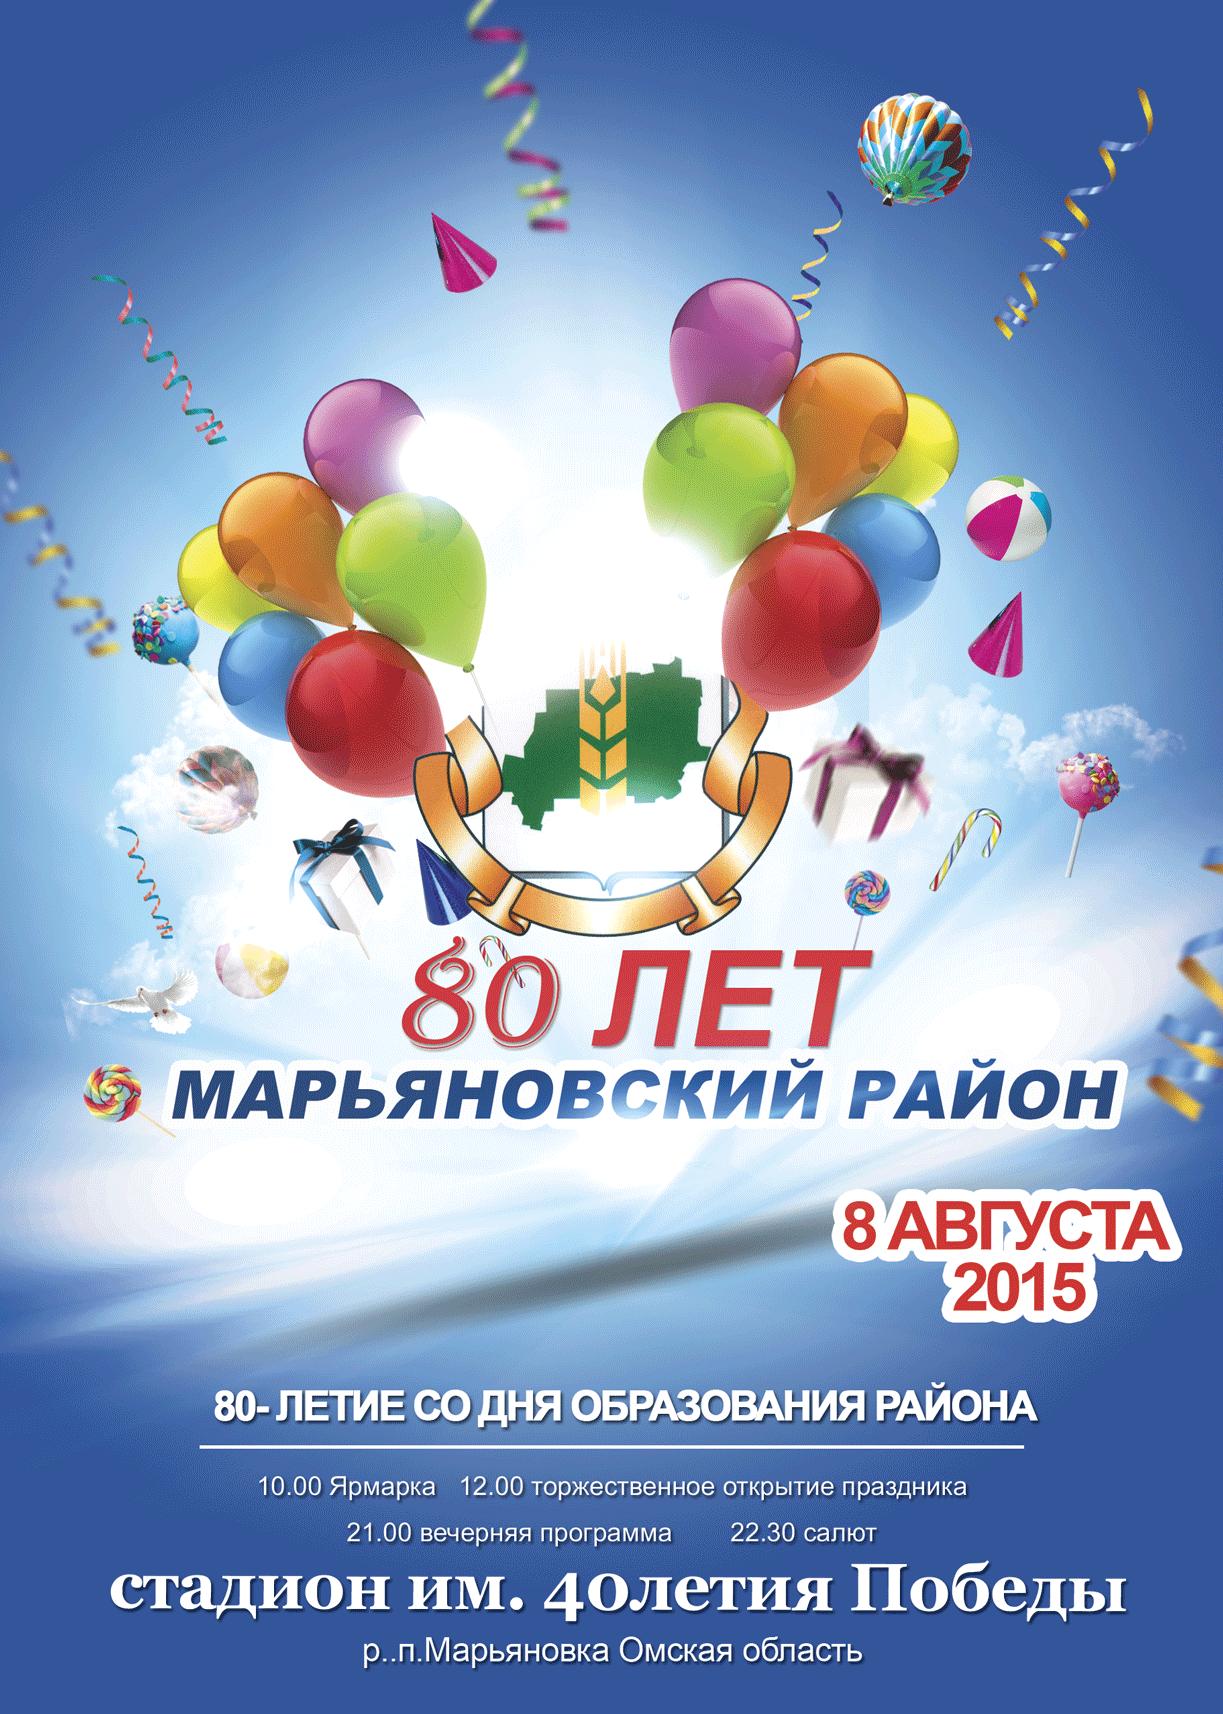 Марьяновка-2015